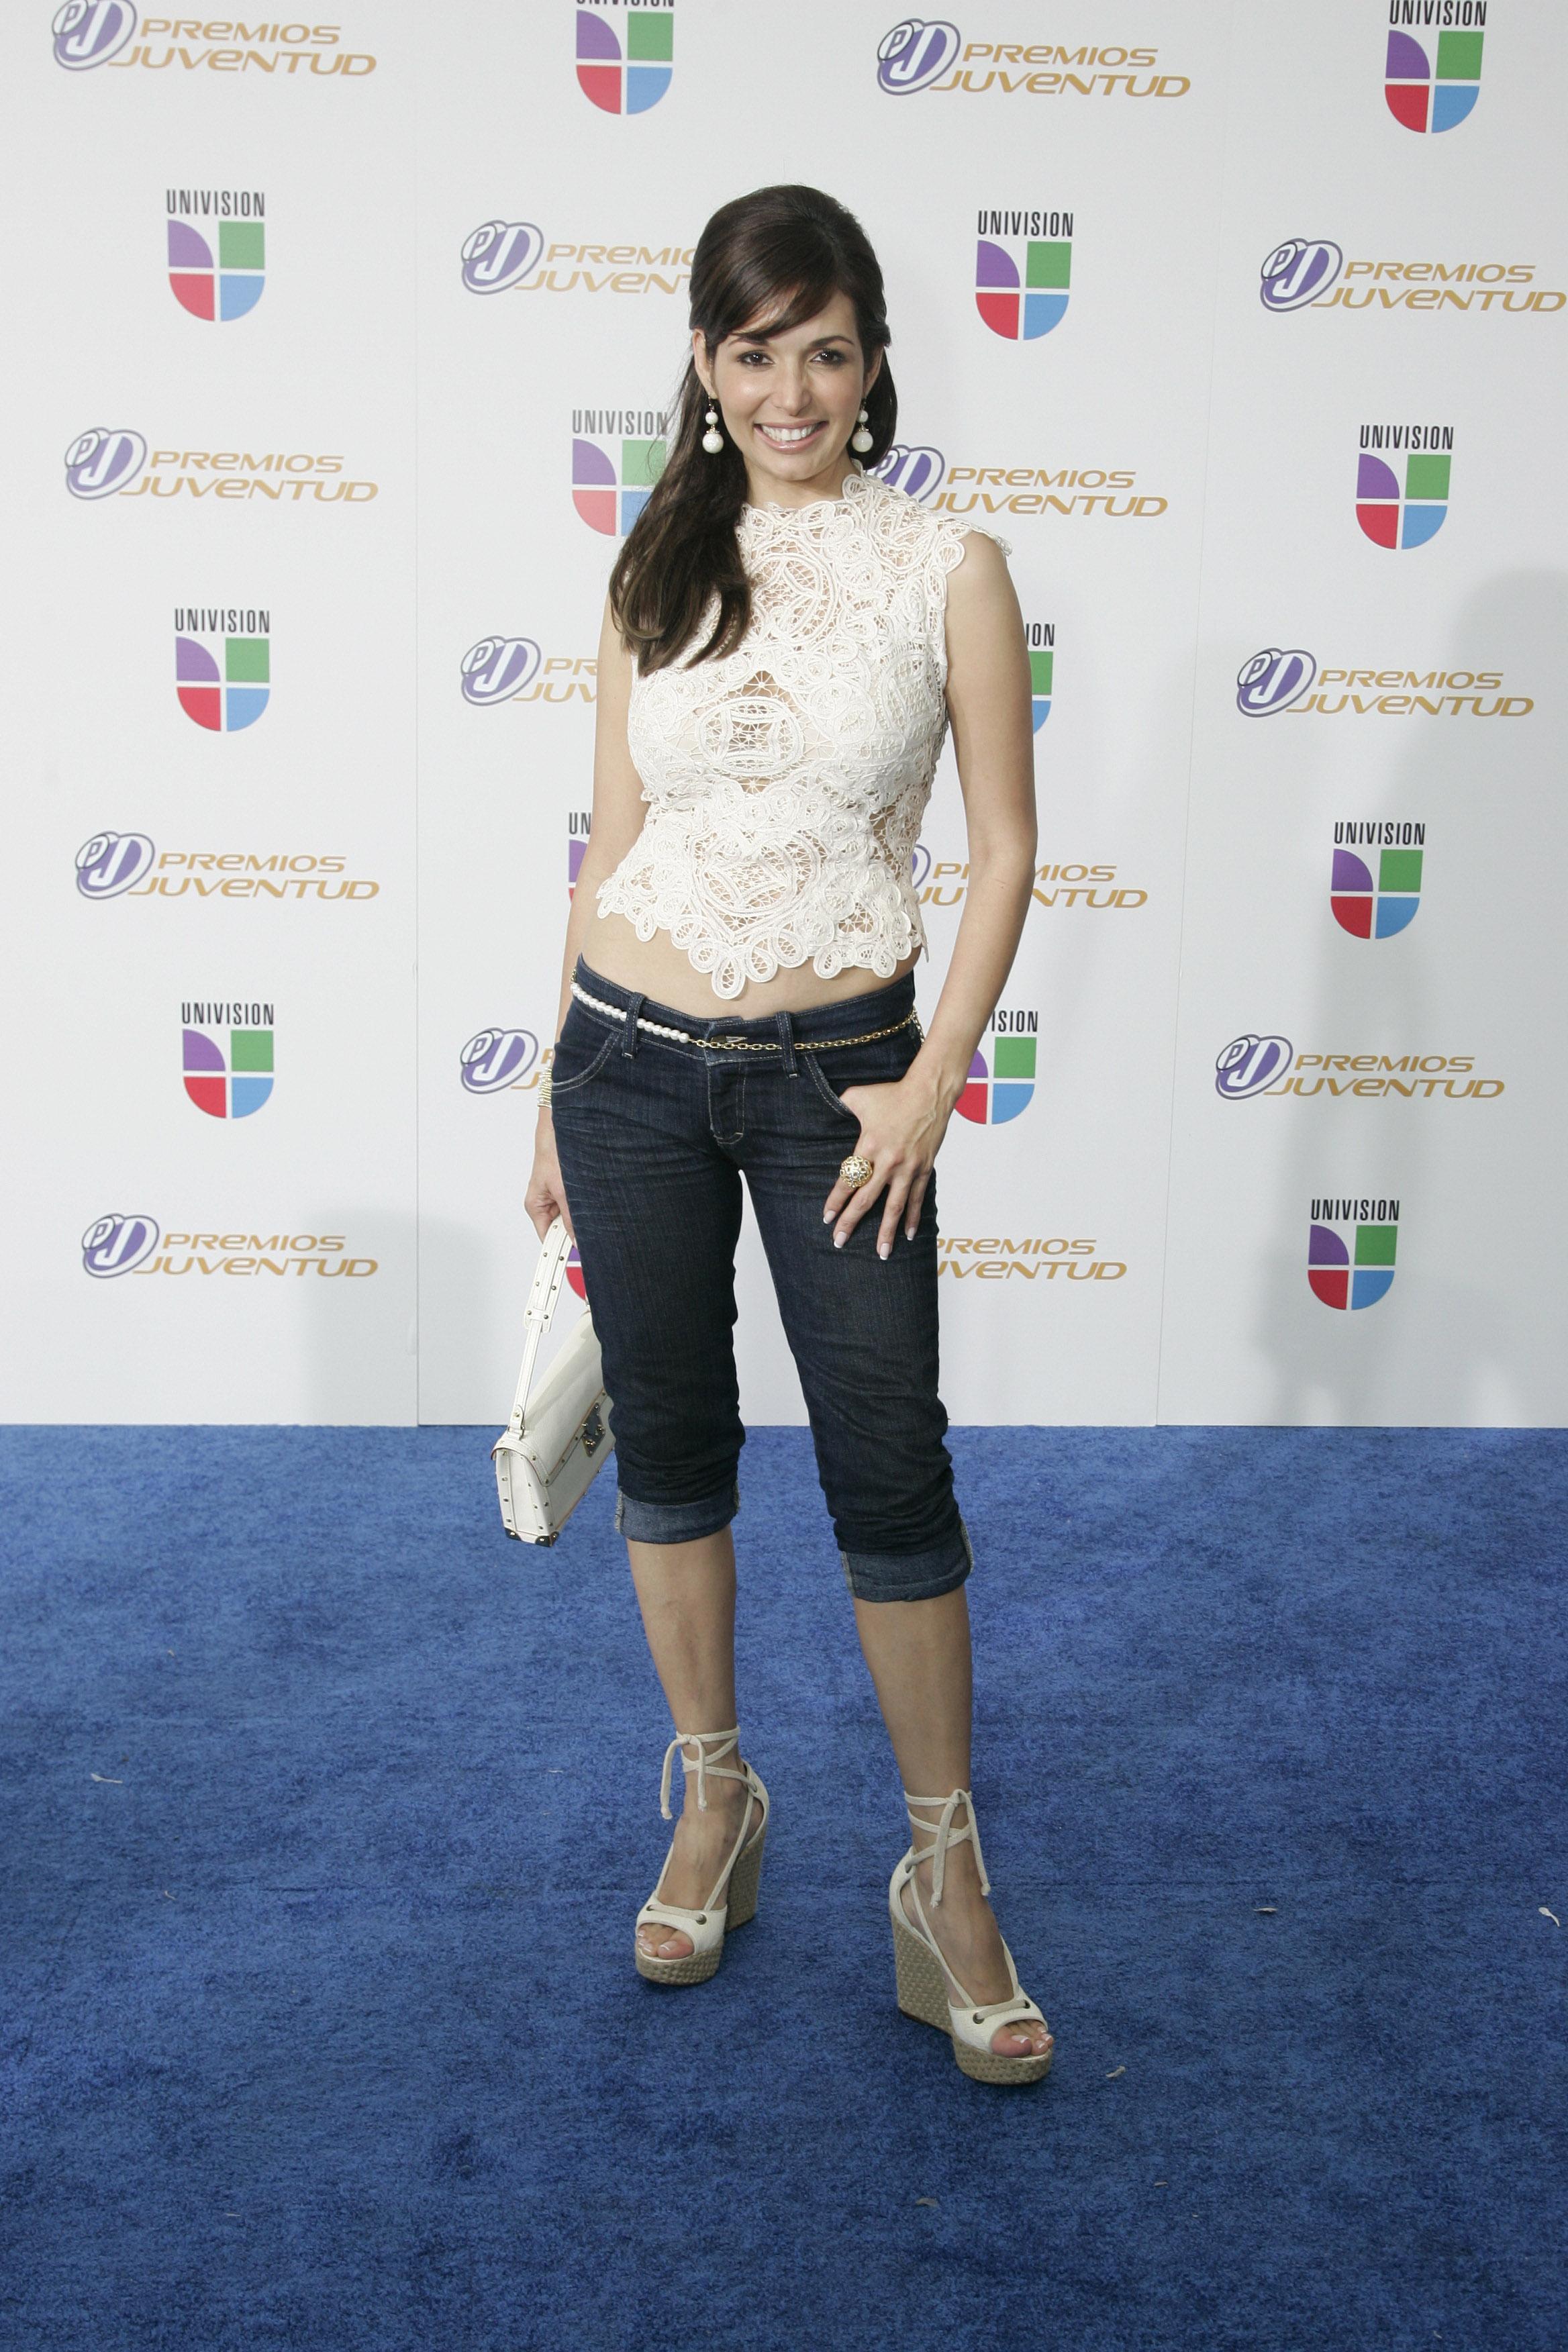 2006 Premios Juventud Awards - Arrivals